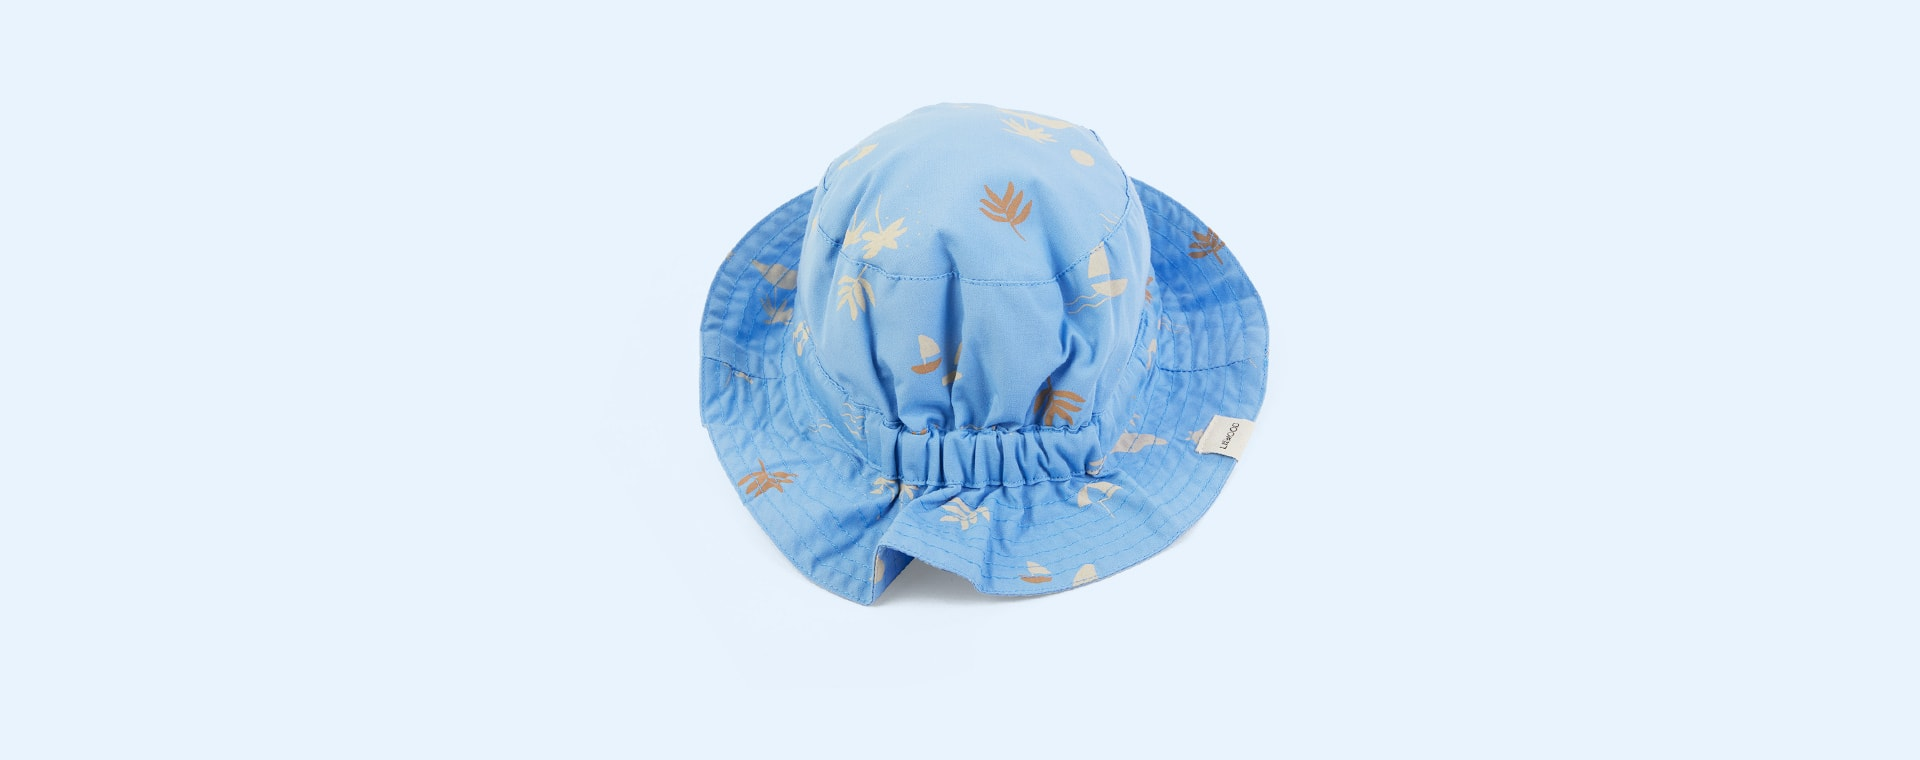 Seaside Sky Blue Liewood Sander Sun Hat